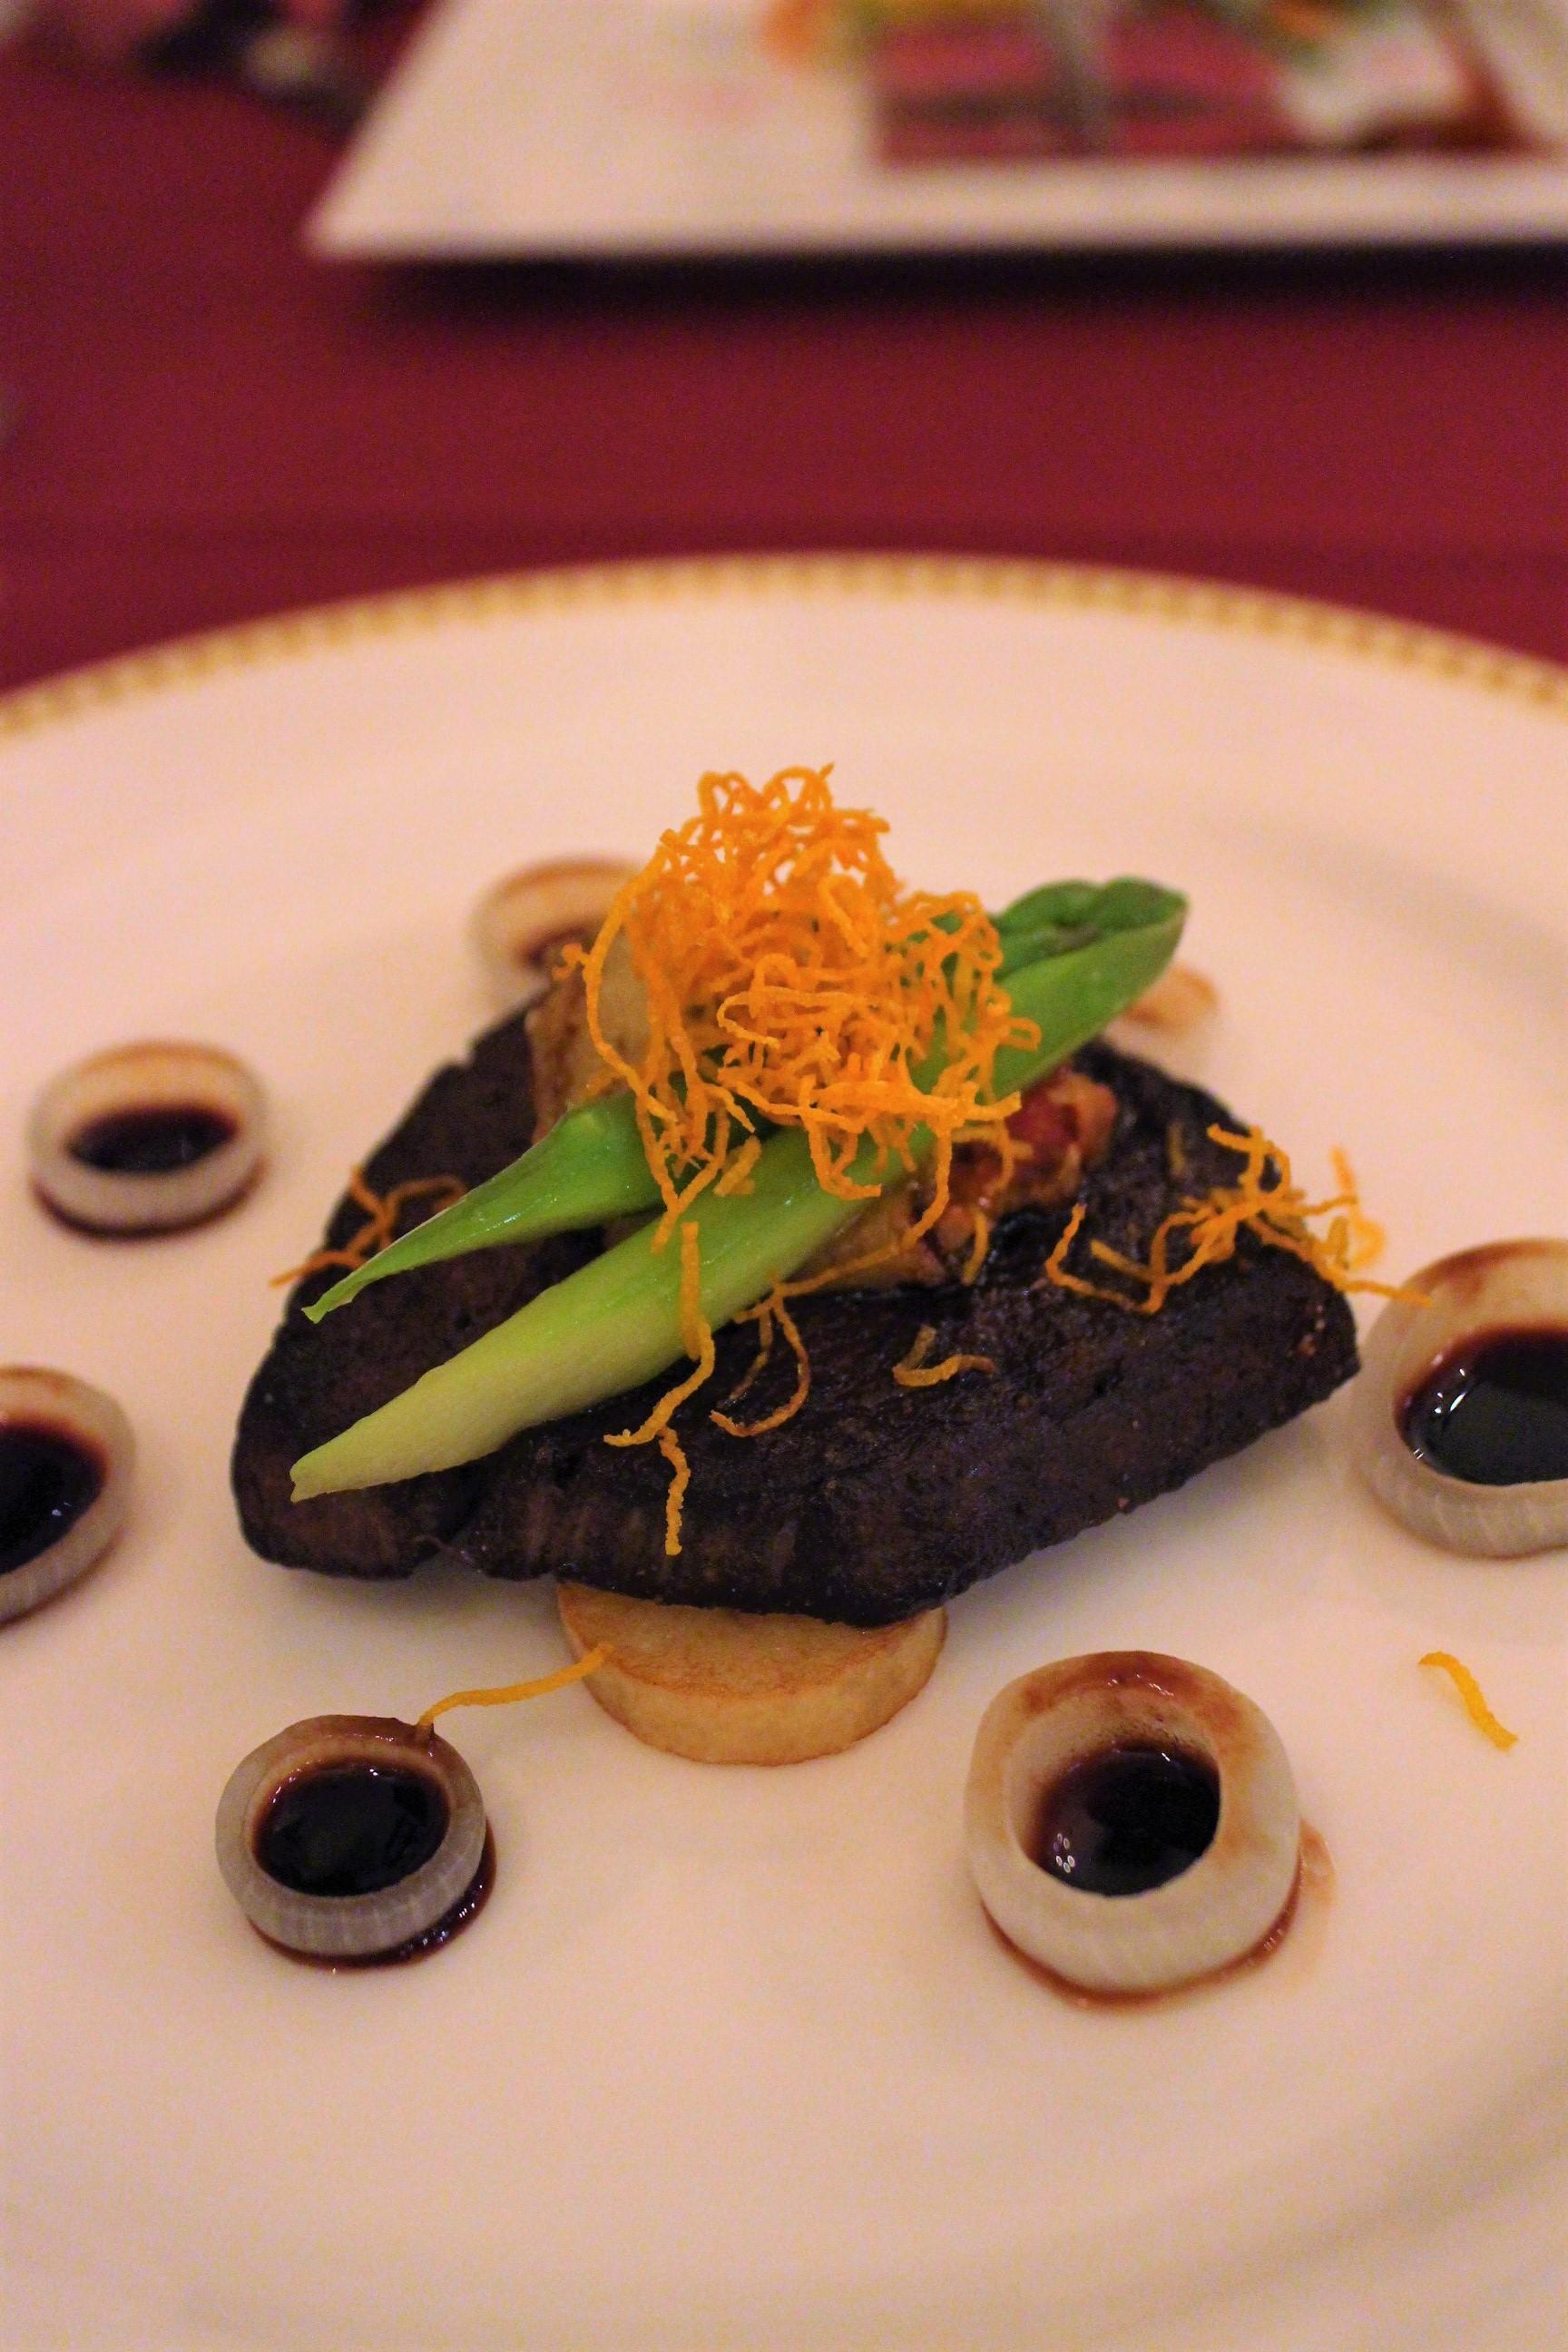 Sautéed Beef Fillet with Red Wine Sauce at Magellan's in DisneySea, Tokyo, Japan